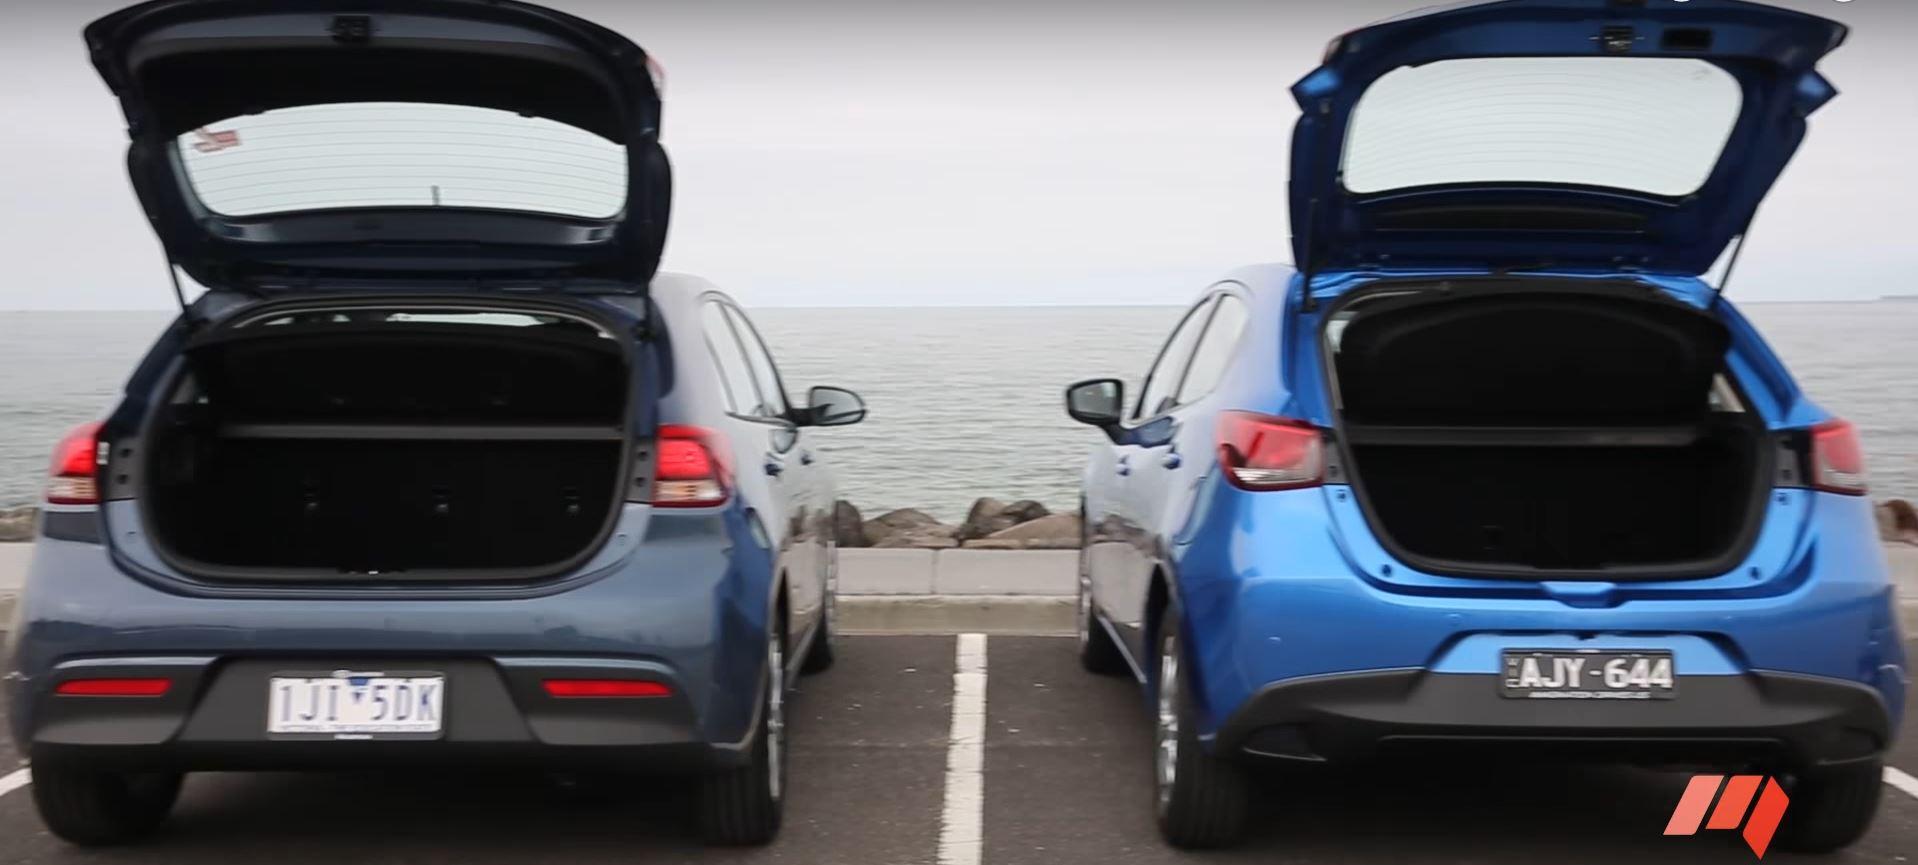 2017 Kia Rio Takes on Mazda2 Hatchback in Australian Review